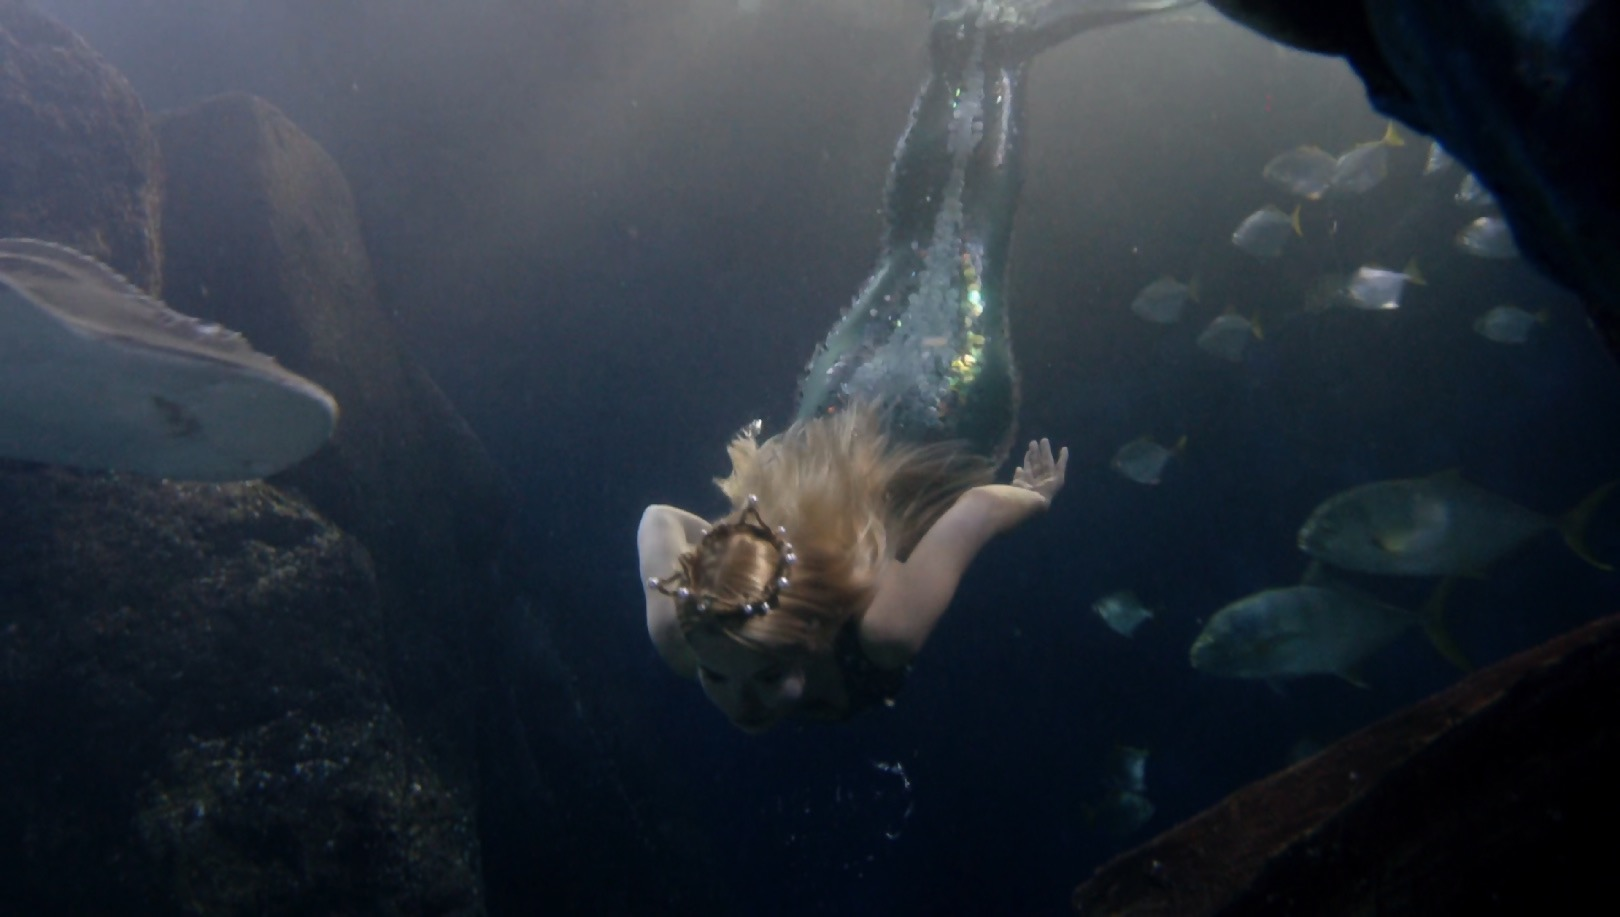 1_Meerjungfrau Zoe_unterwasser